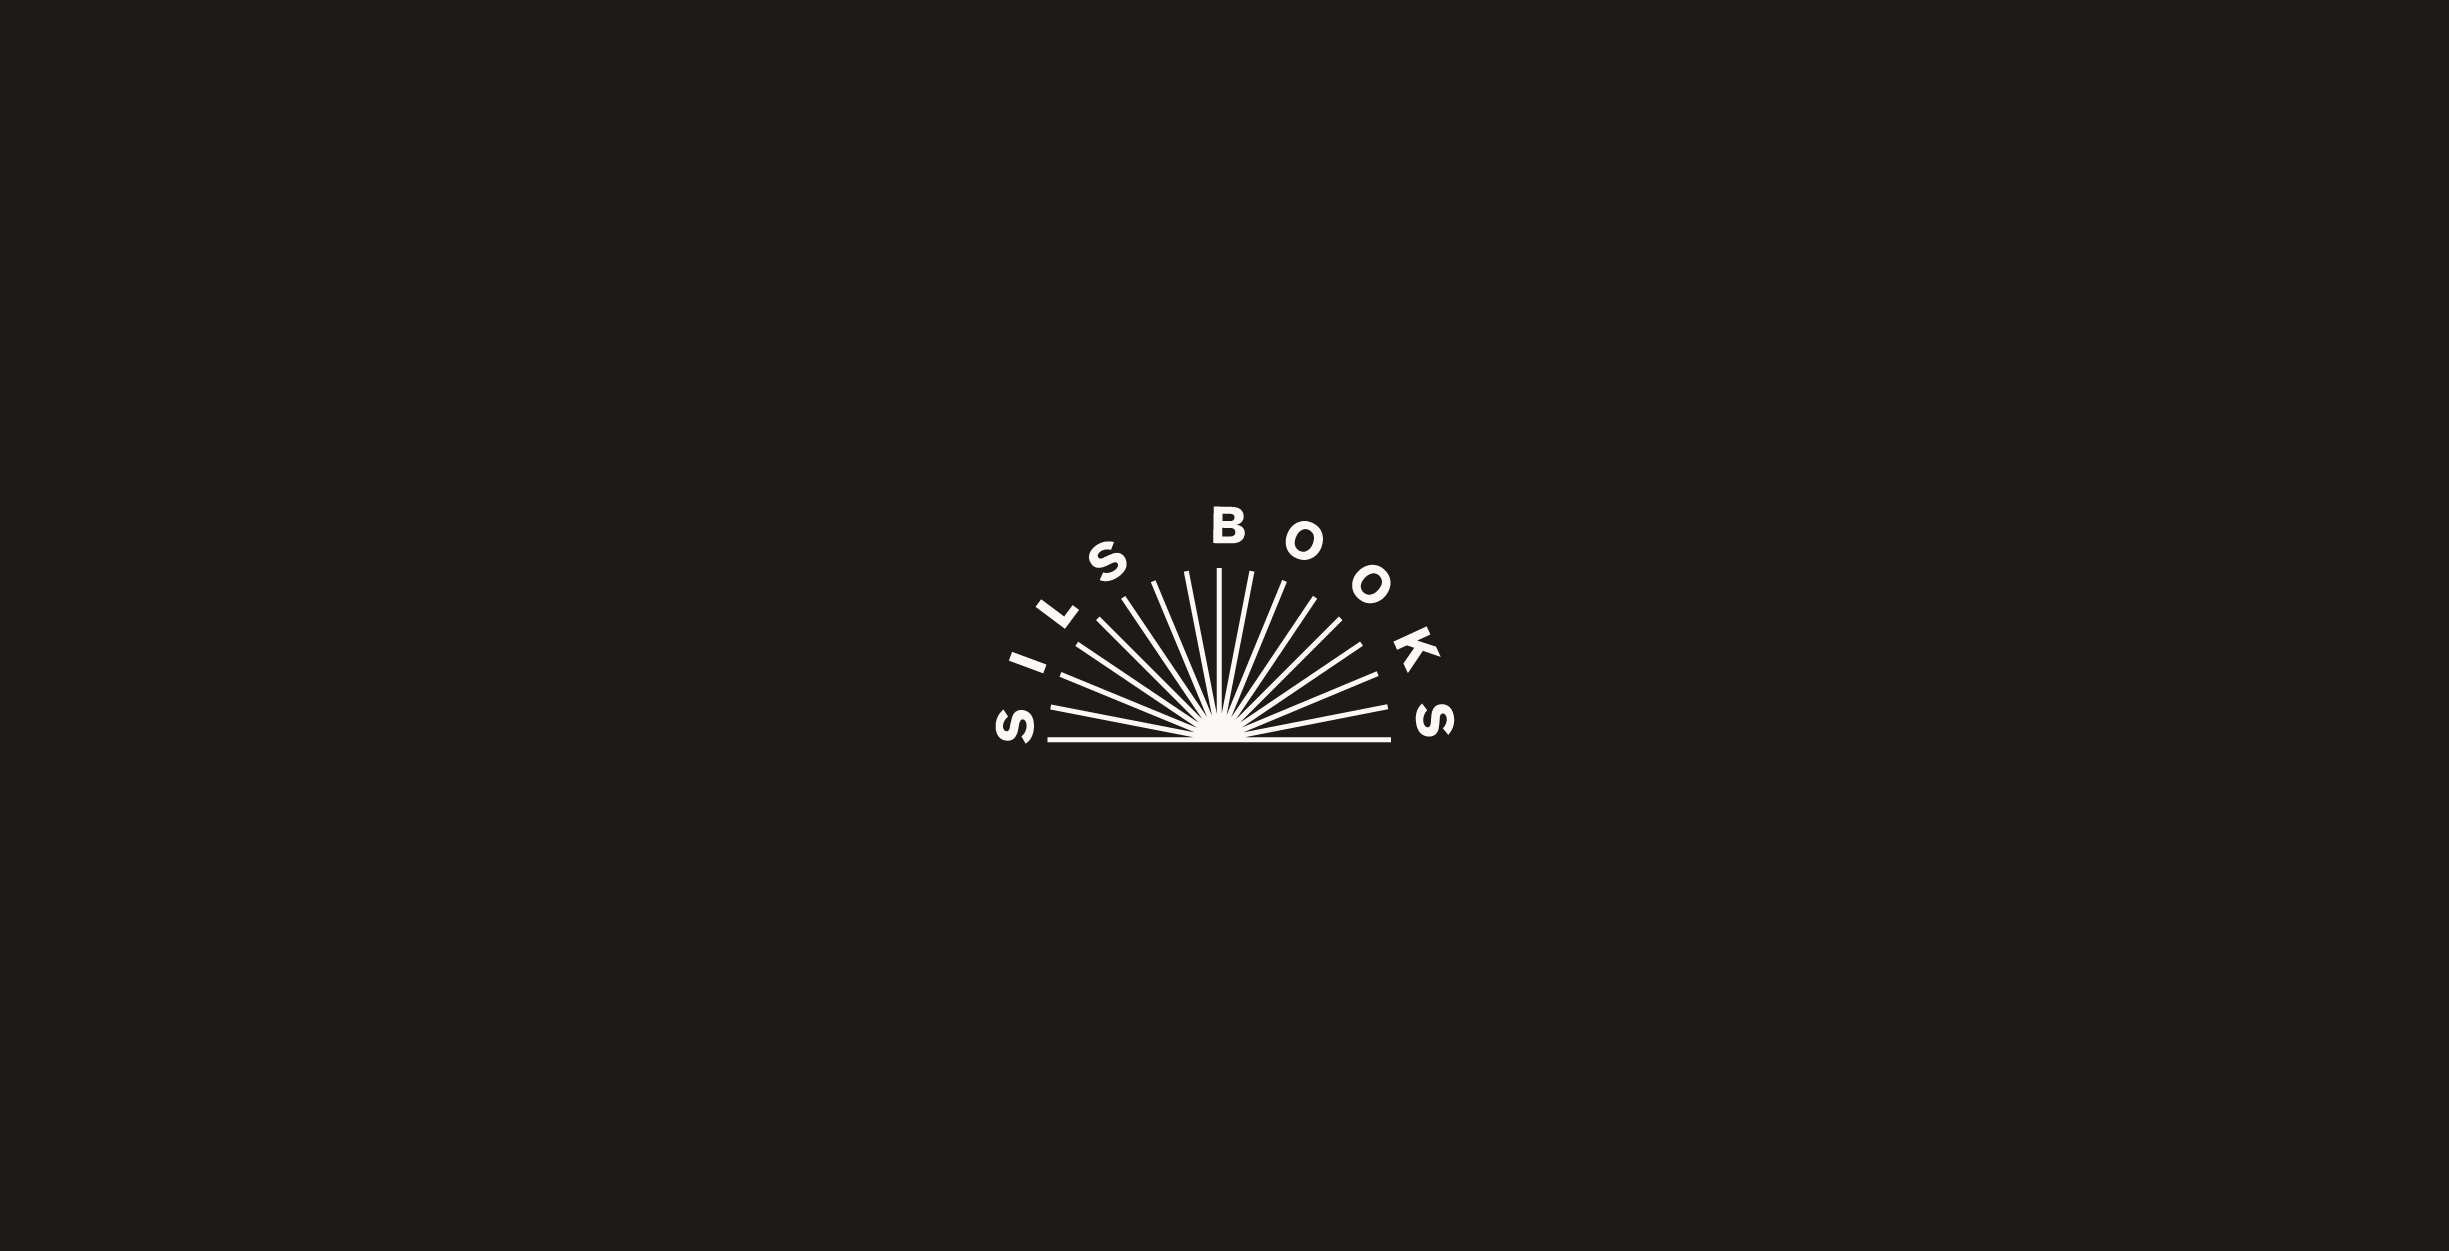 logos-2-v4-30